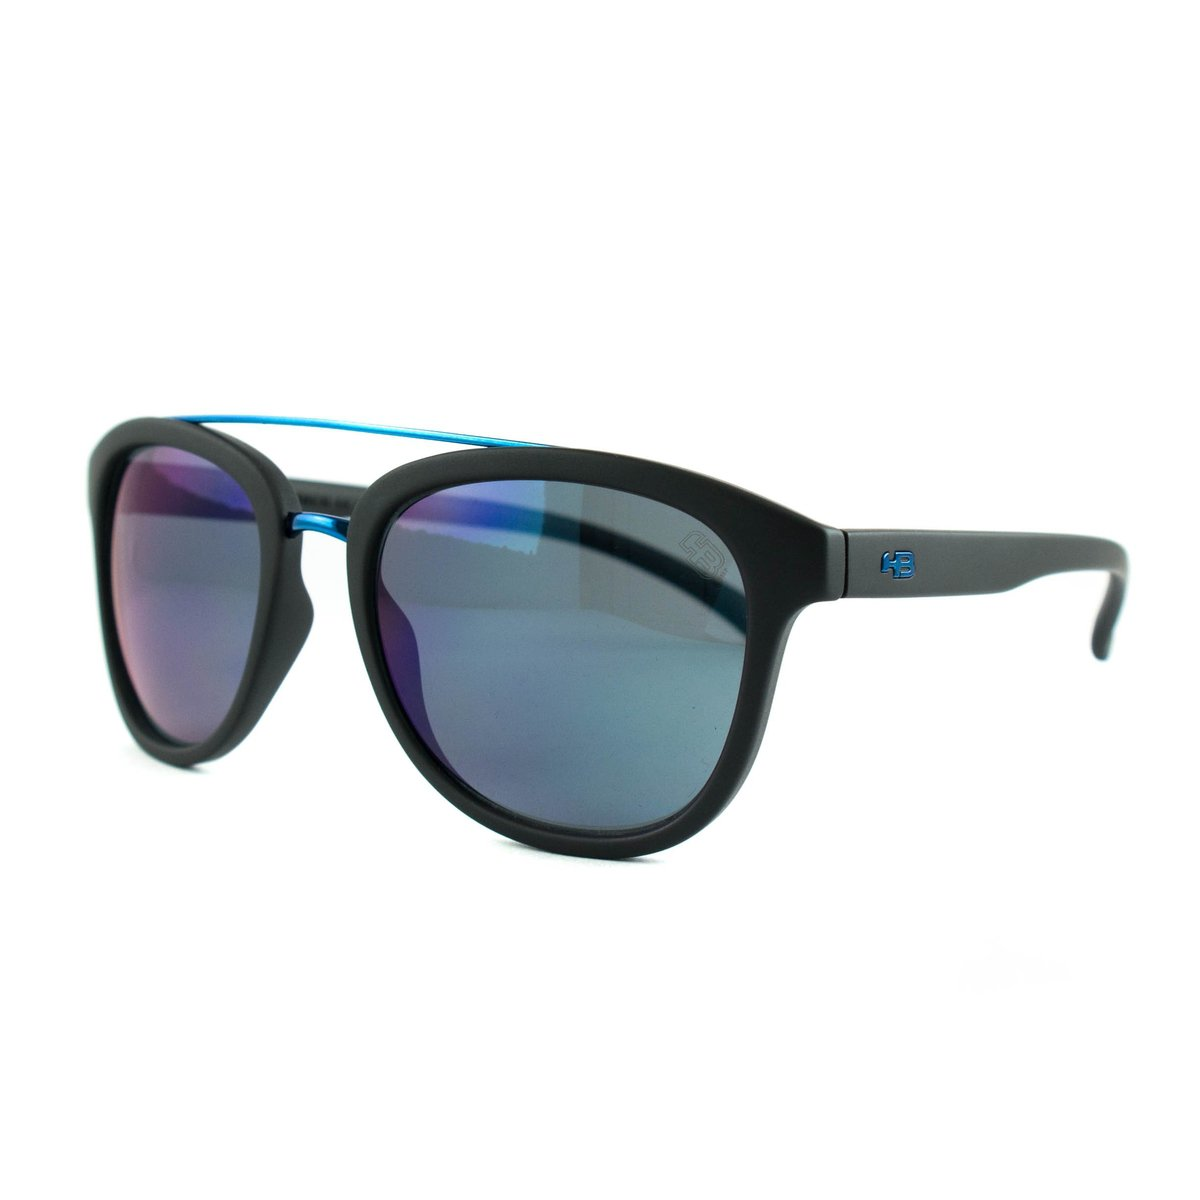 99a7dd767f7ad Óculos HB Moomba - Compre Agora